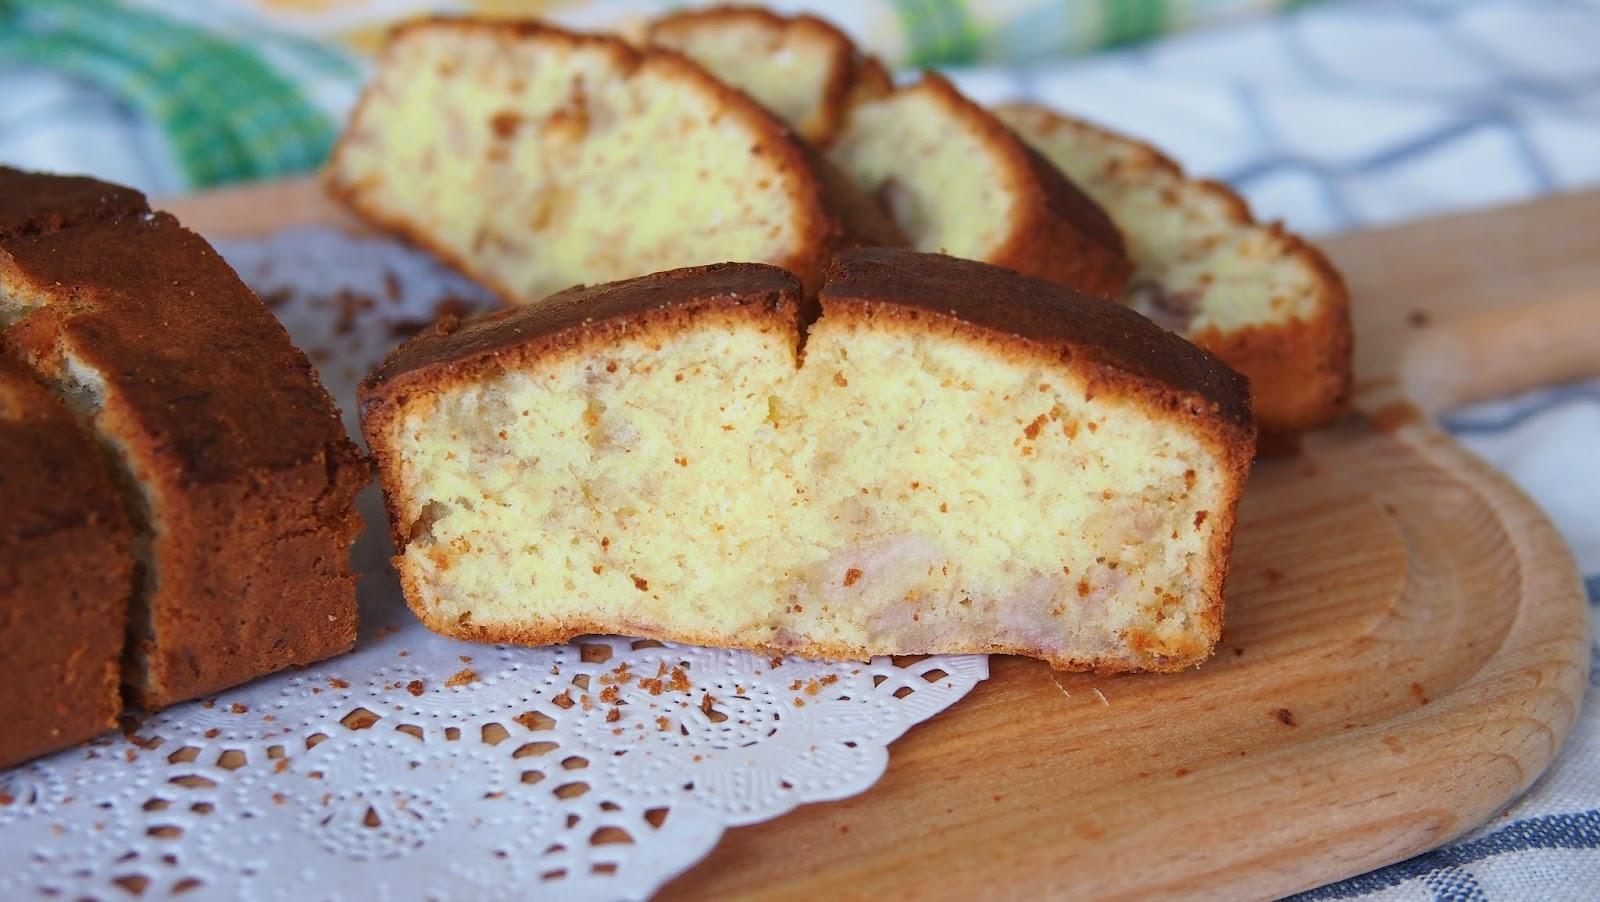 Sicikitchen: 【下午茶時間】Carol自在生活的香蕉蛋糕食譜